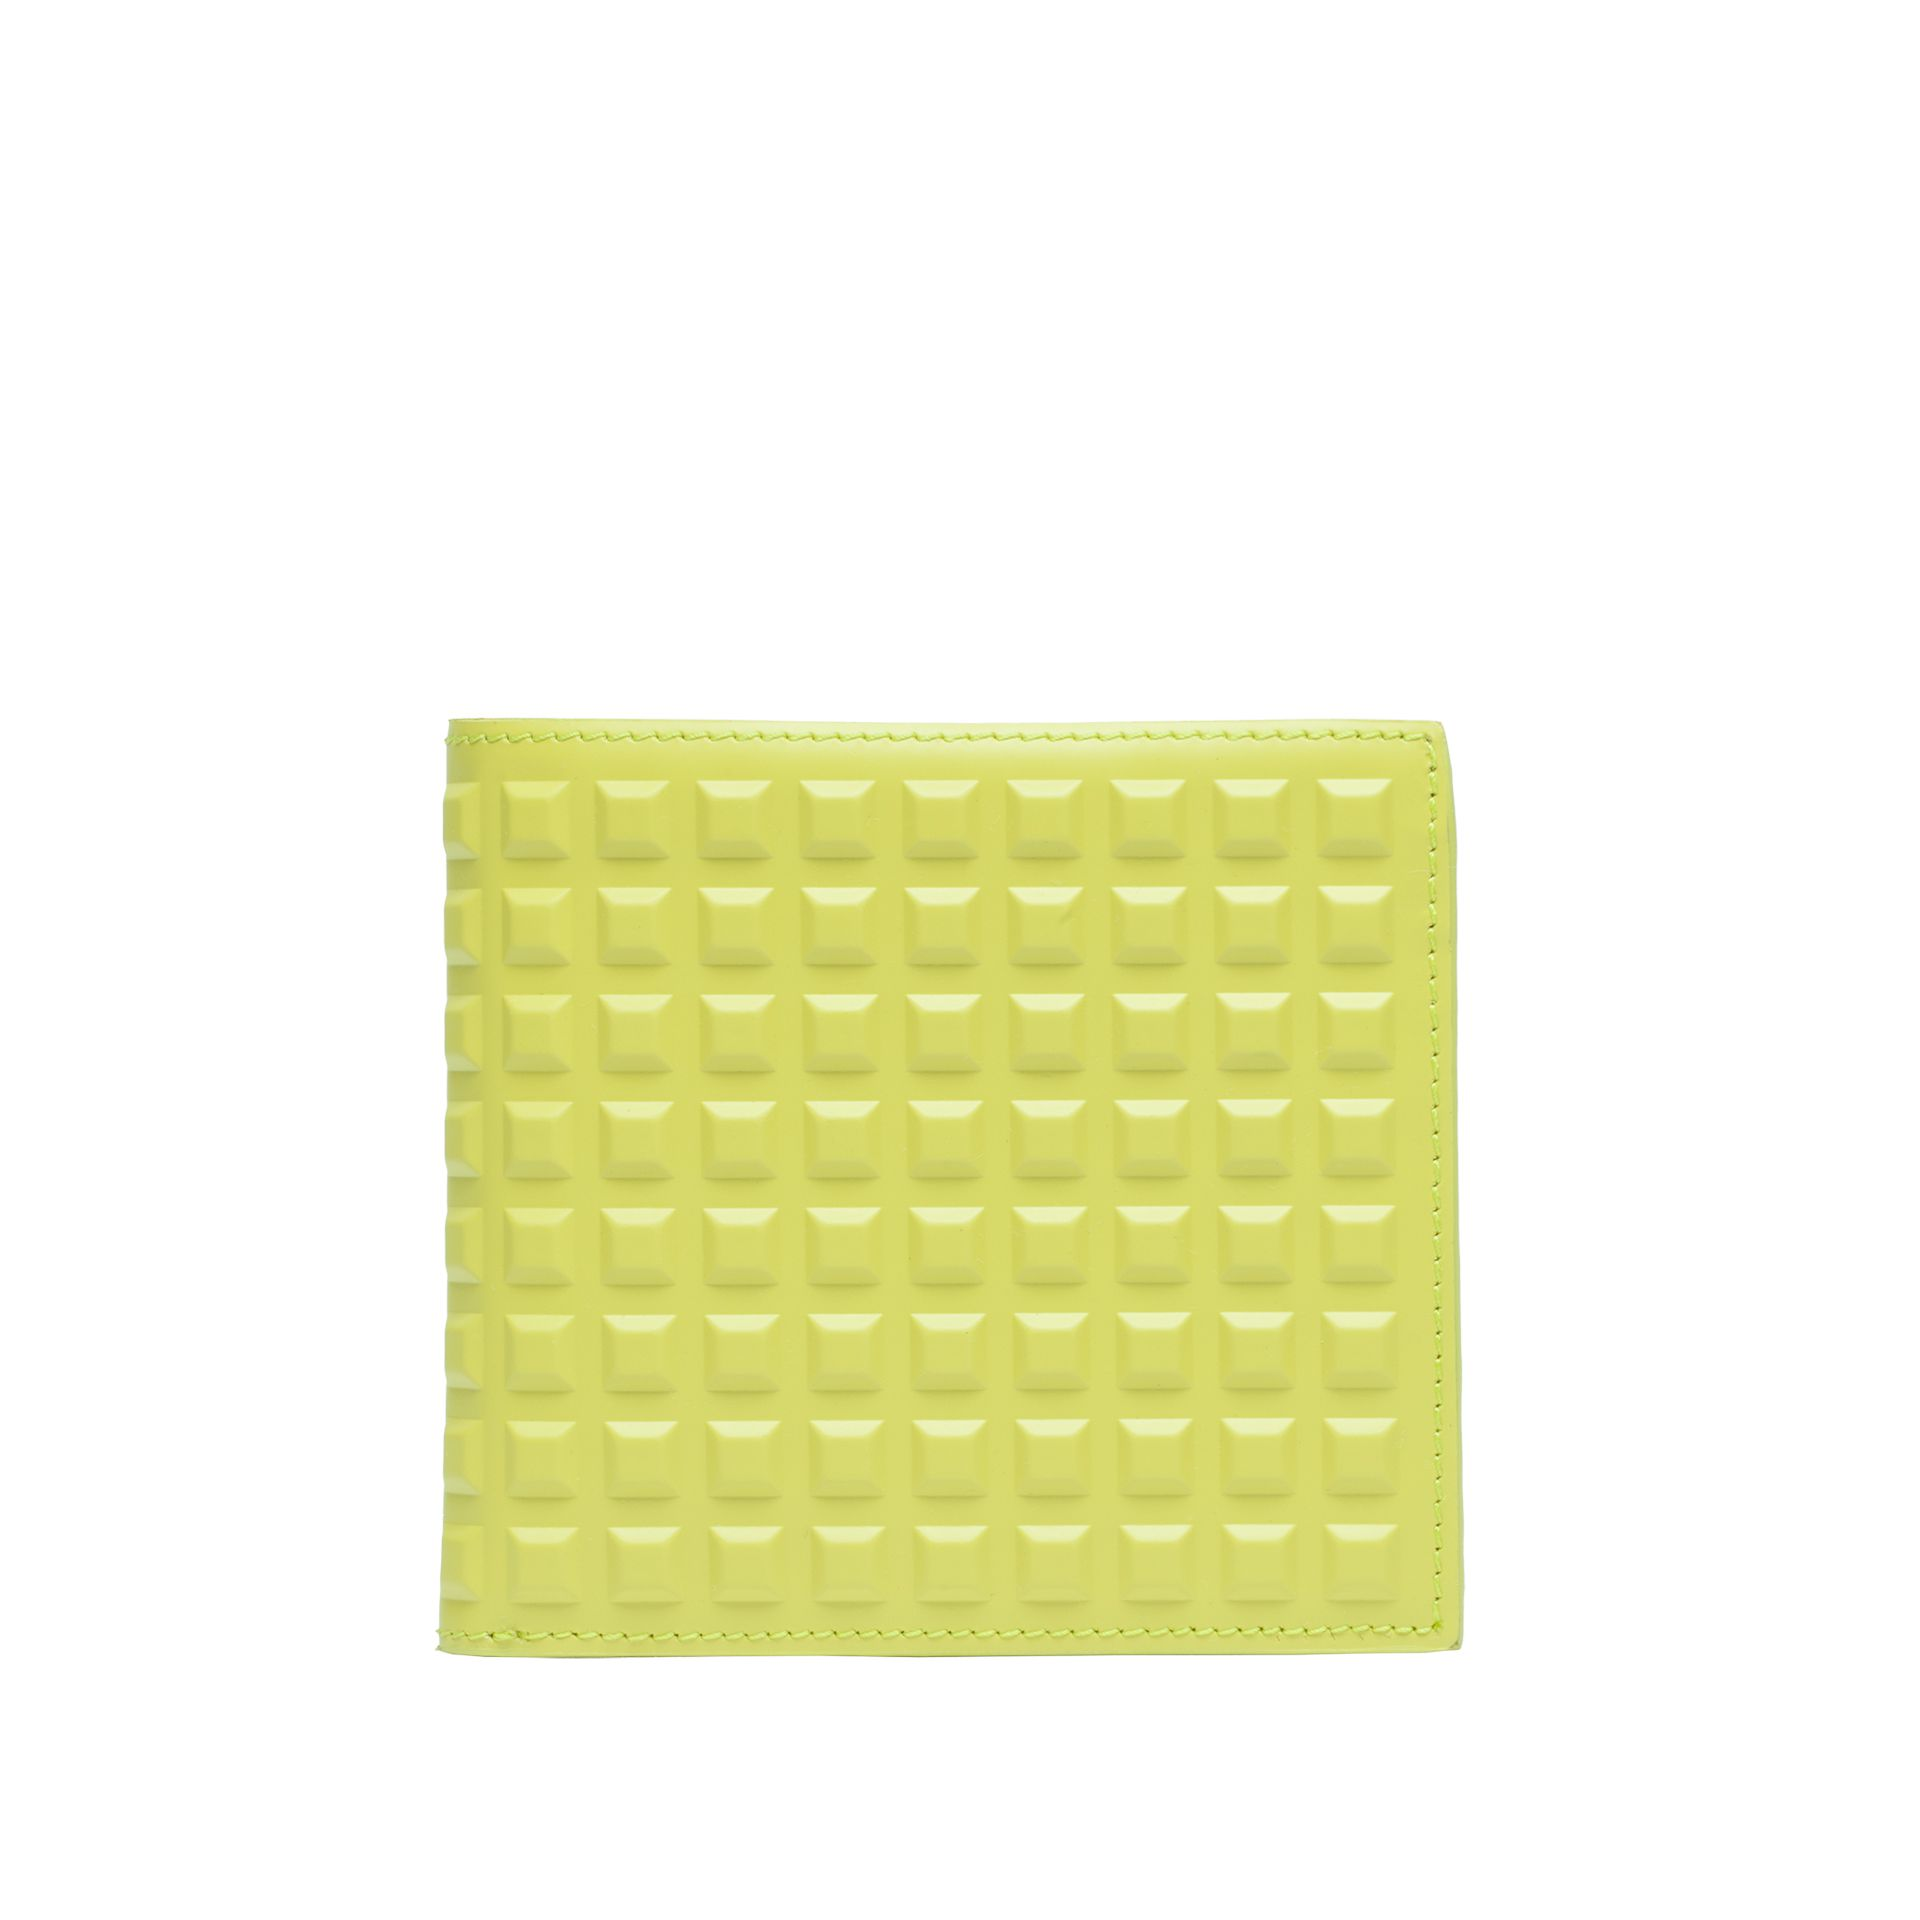 BALENCIAGA Balenciaga Square Wallet Grid Portefeuilles U f